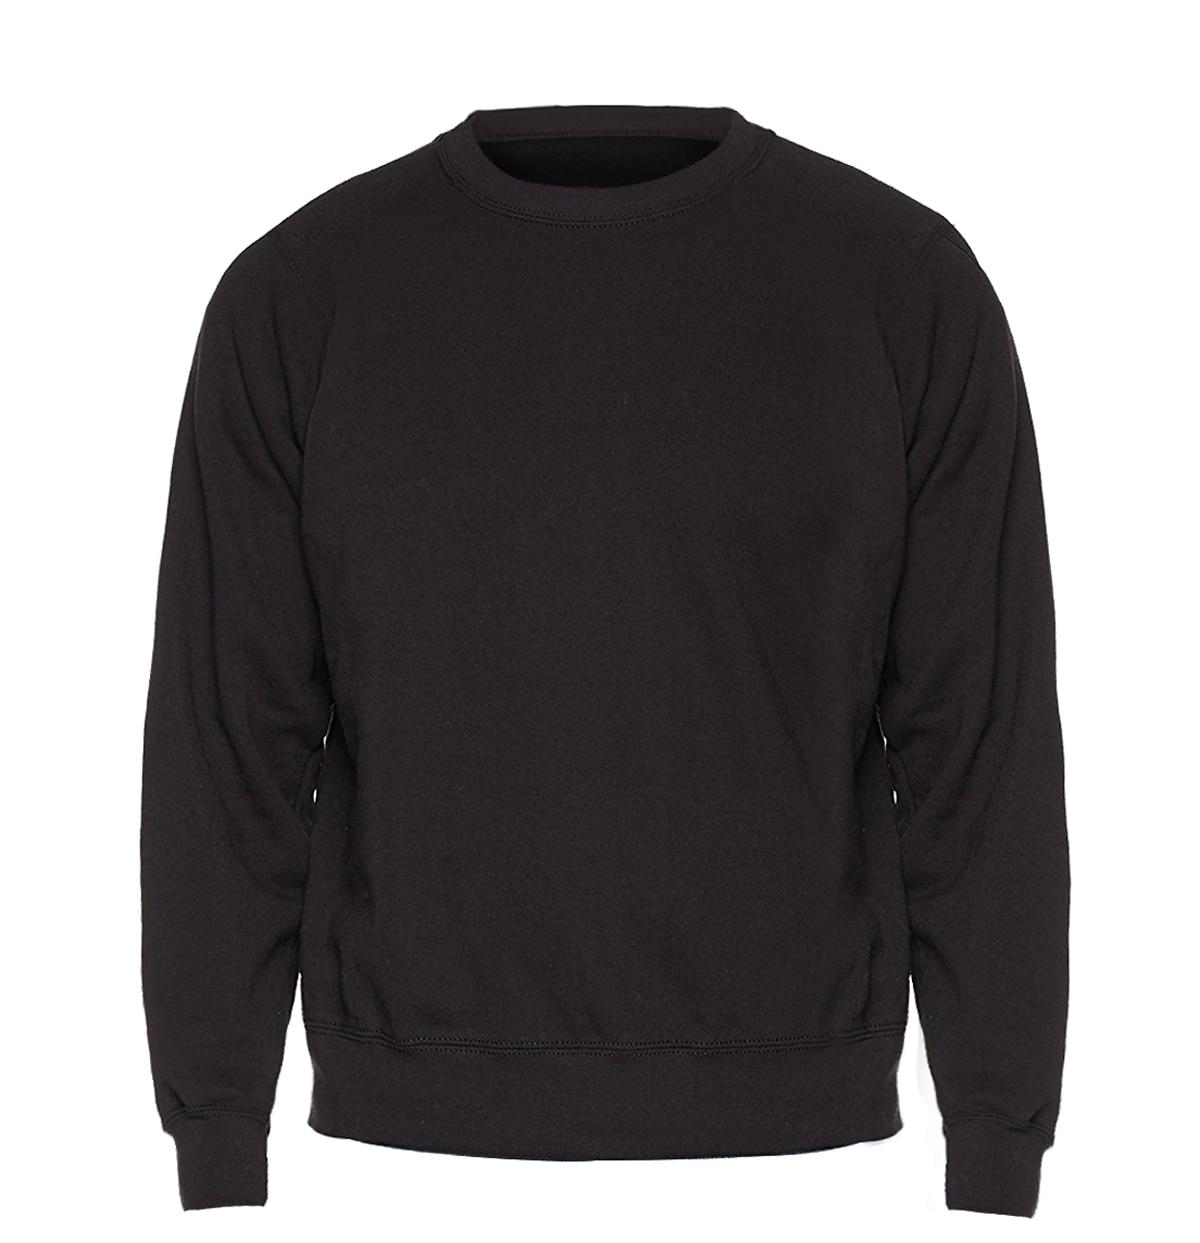 Solid color Sweatshirt Men Hoodie Crewneck Sweatshirts Winter Autumn Fleece Hoody Casual Gray Blue Red Black White Streetwear 9